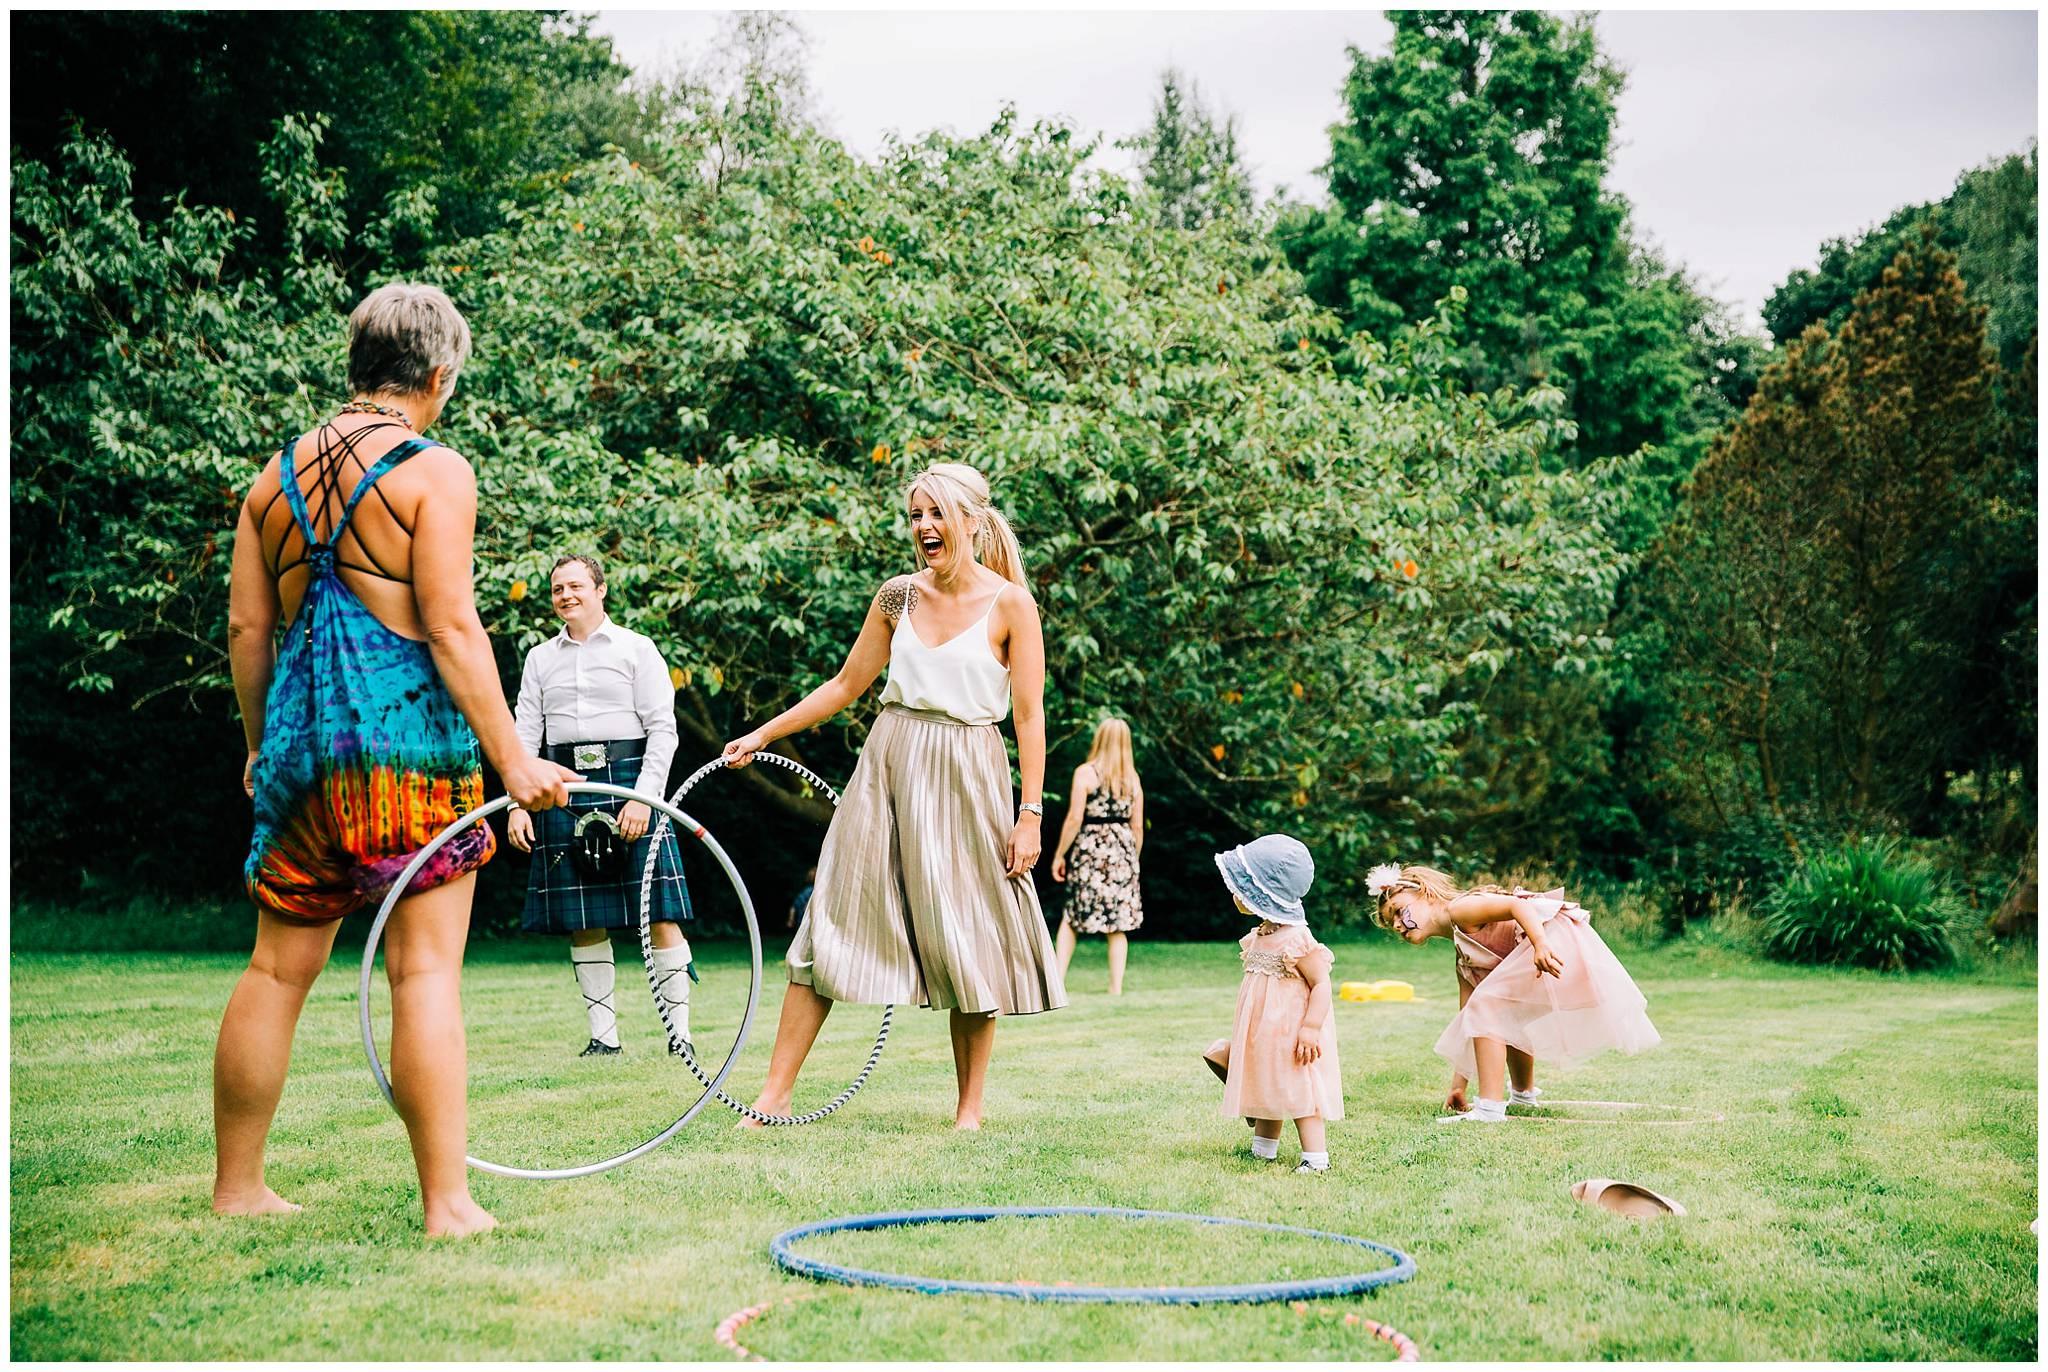 LANCASHIRE - RUSTIC, QUIRKY AND UNIQUE WEDDING VENUES